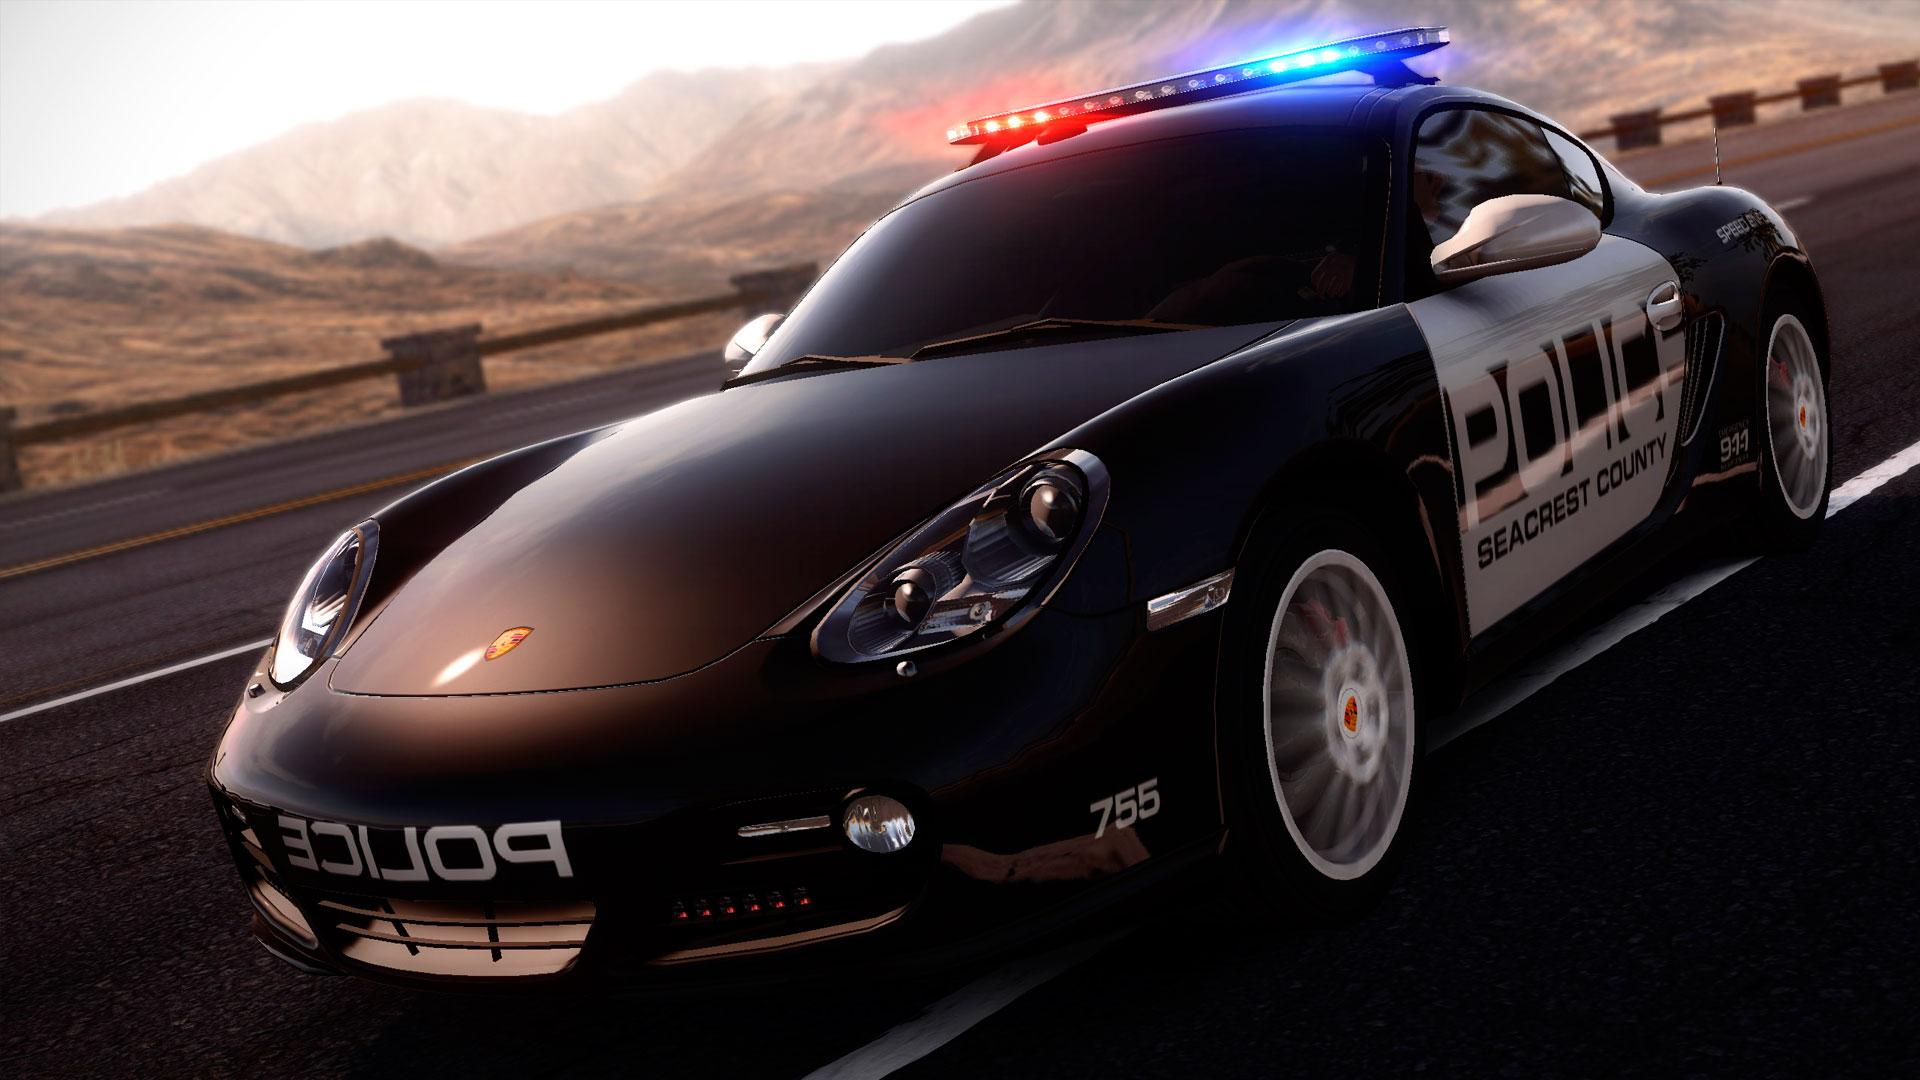 Police Car Hd Desktop Image 6160 Wallpaper Wallpaper hd 1920x1080